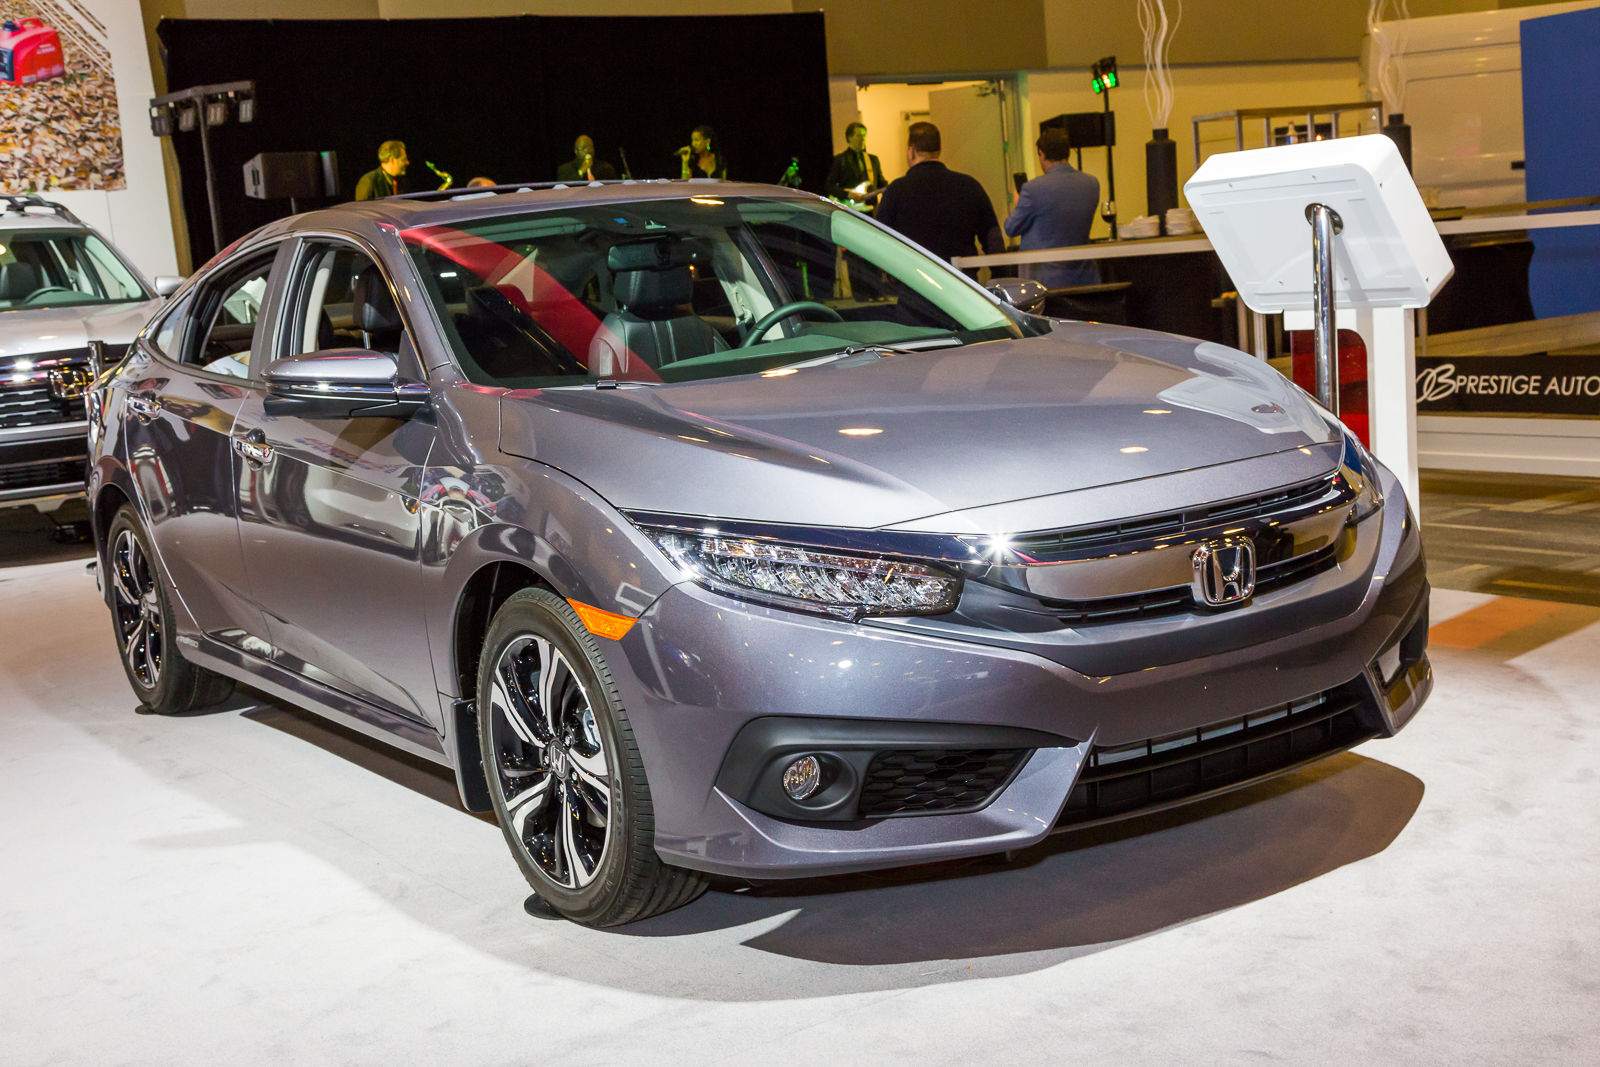 Image Result For Honda Civic Canada Customer Service